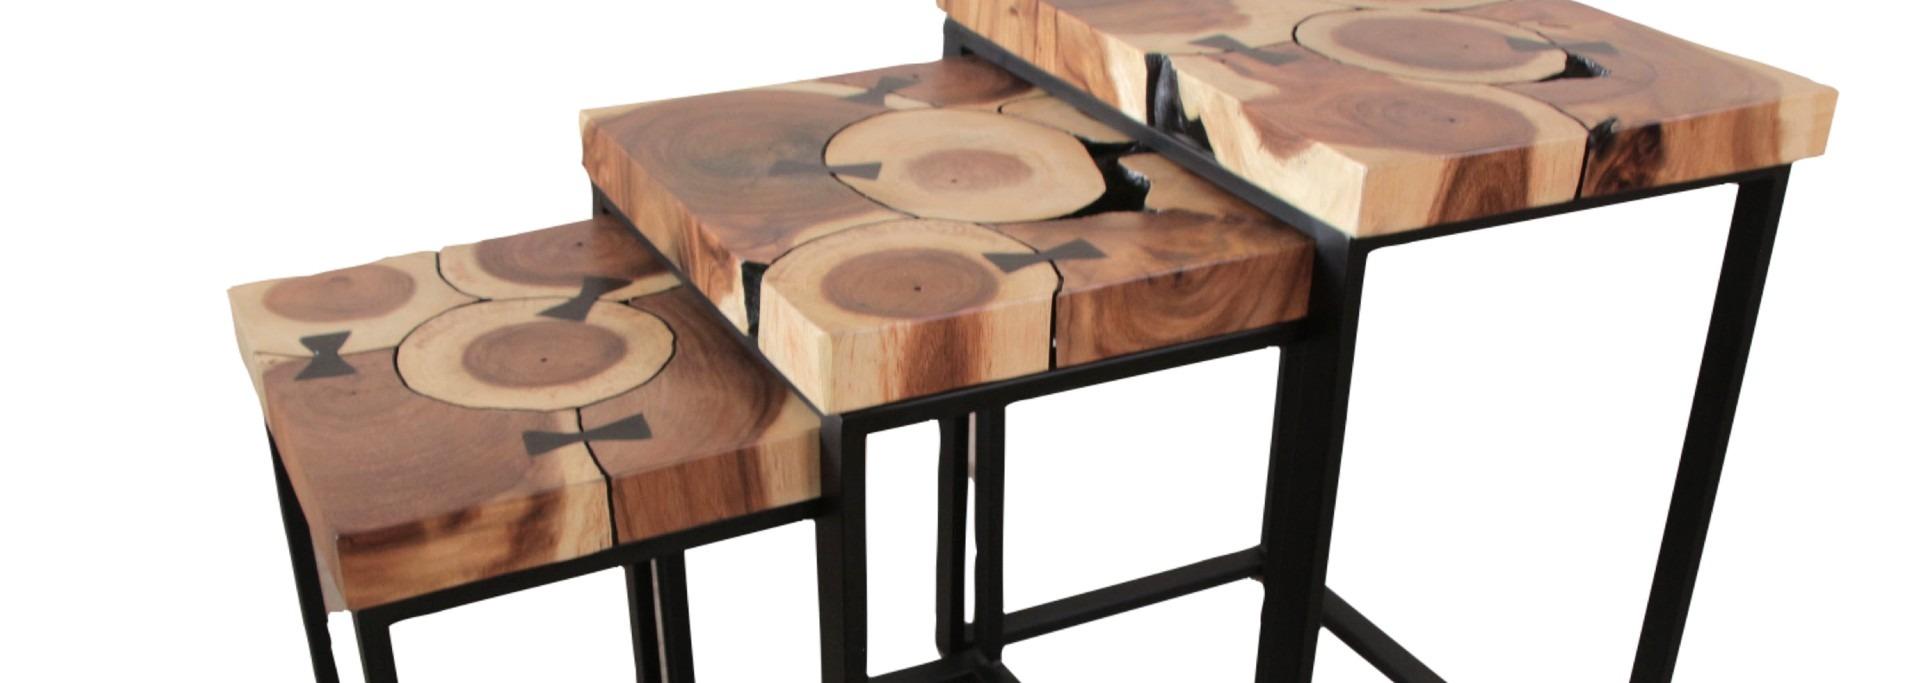 Sentana Art Wood